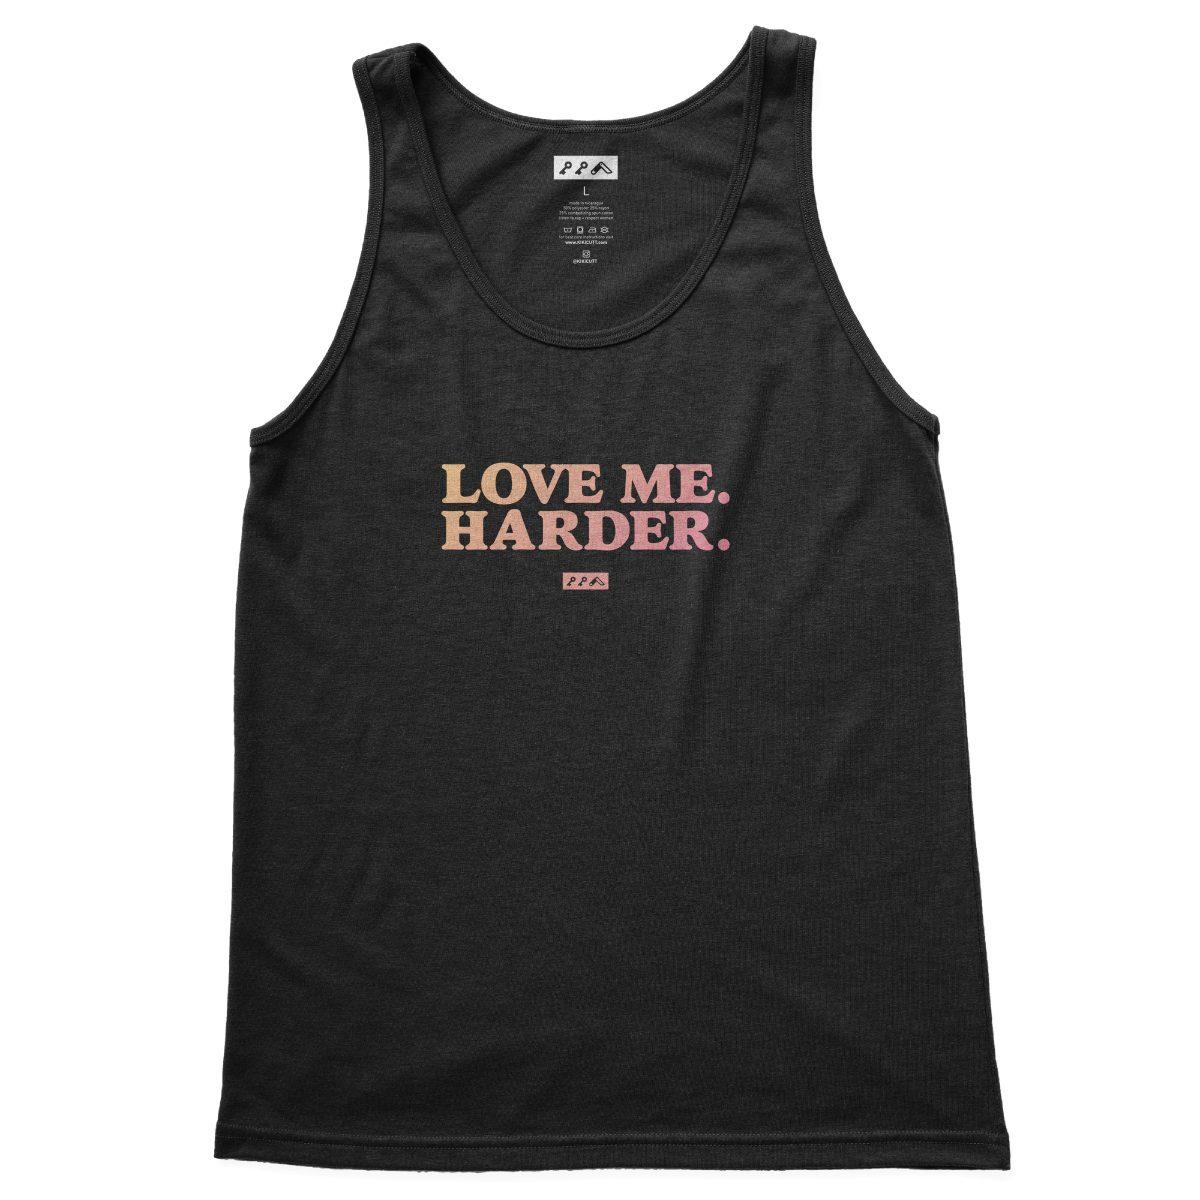 love me harder funny sex quotes tank top black tri-blend at kikicutt.com